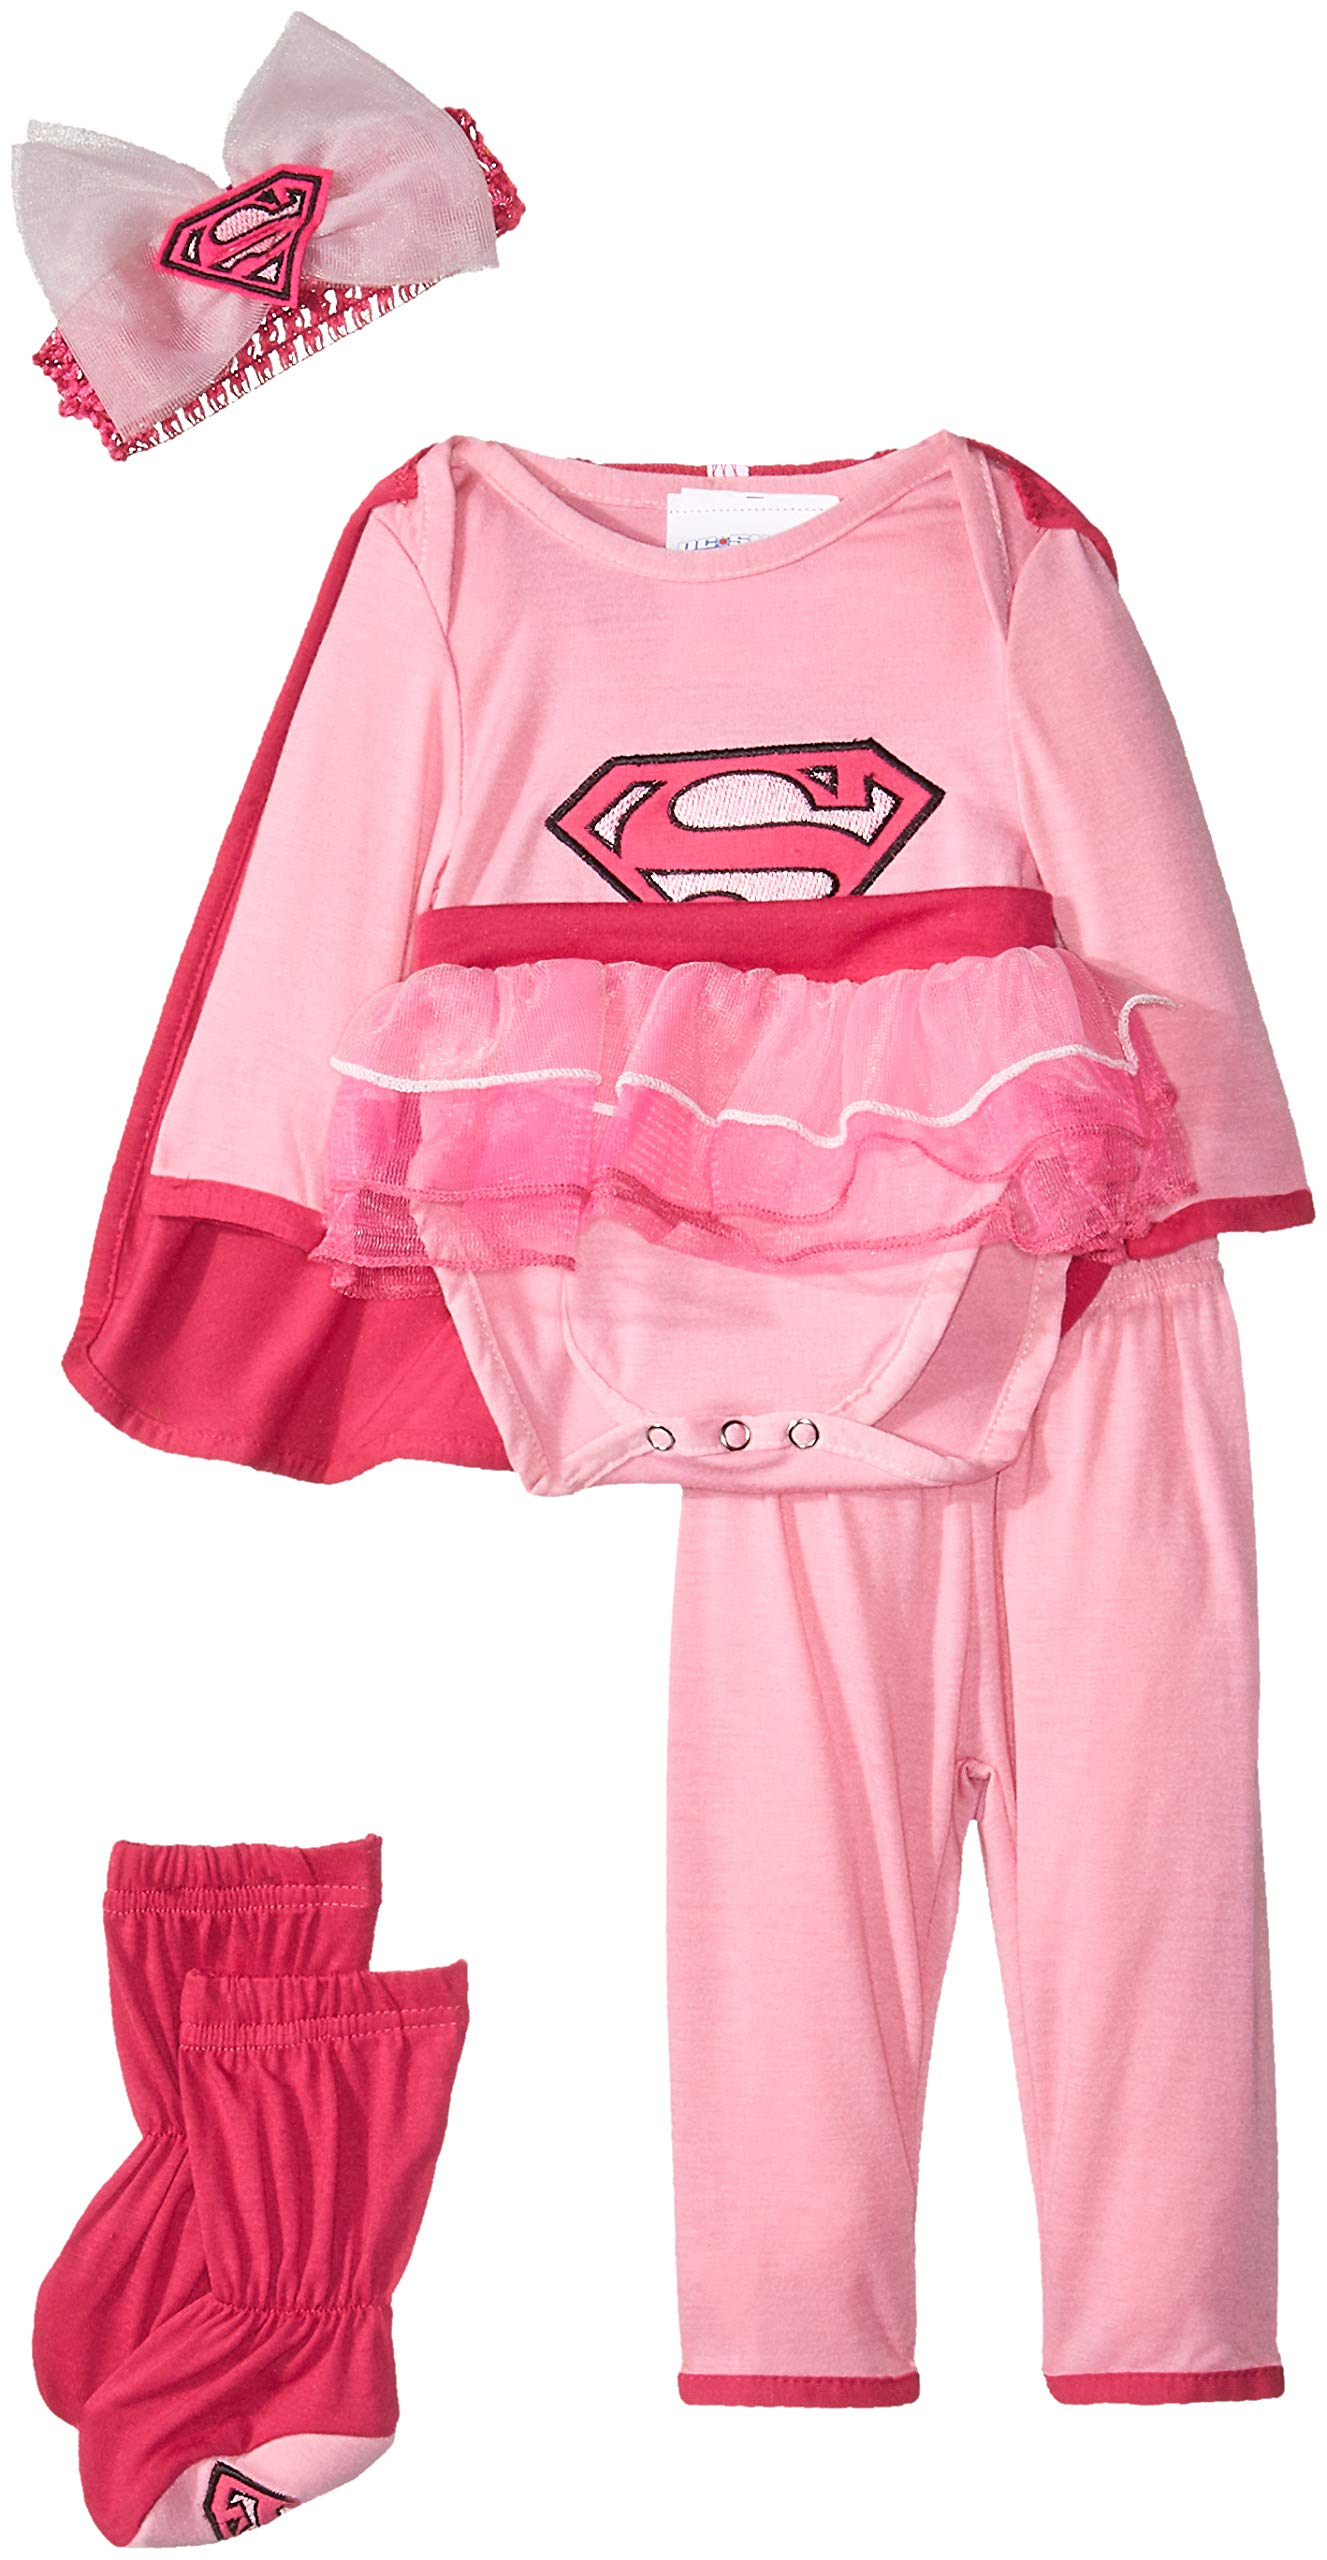 3bf12654f Amazon.com : Gund DC Comics Sound Toy Supergirl Yvette : Baby